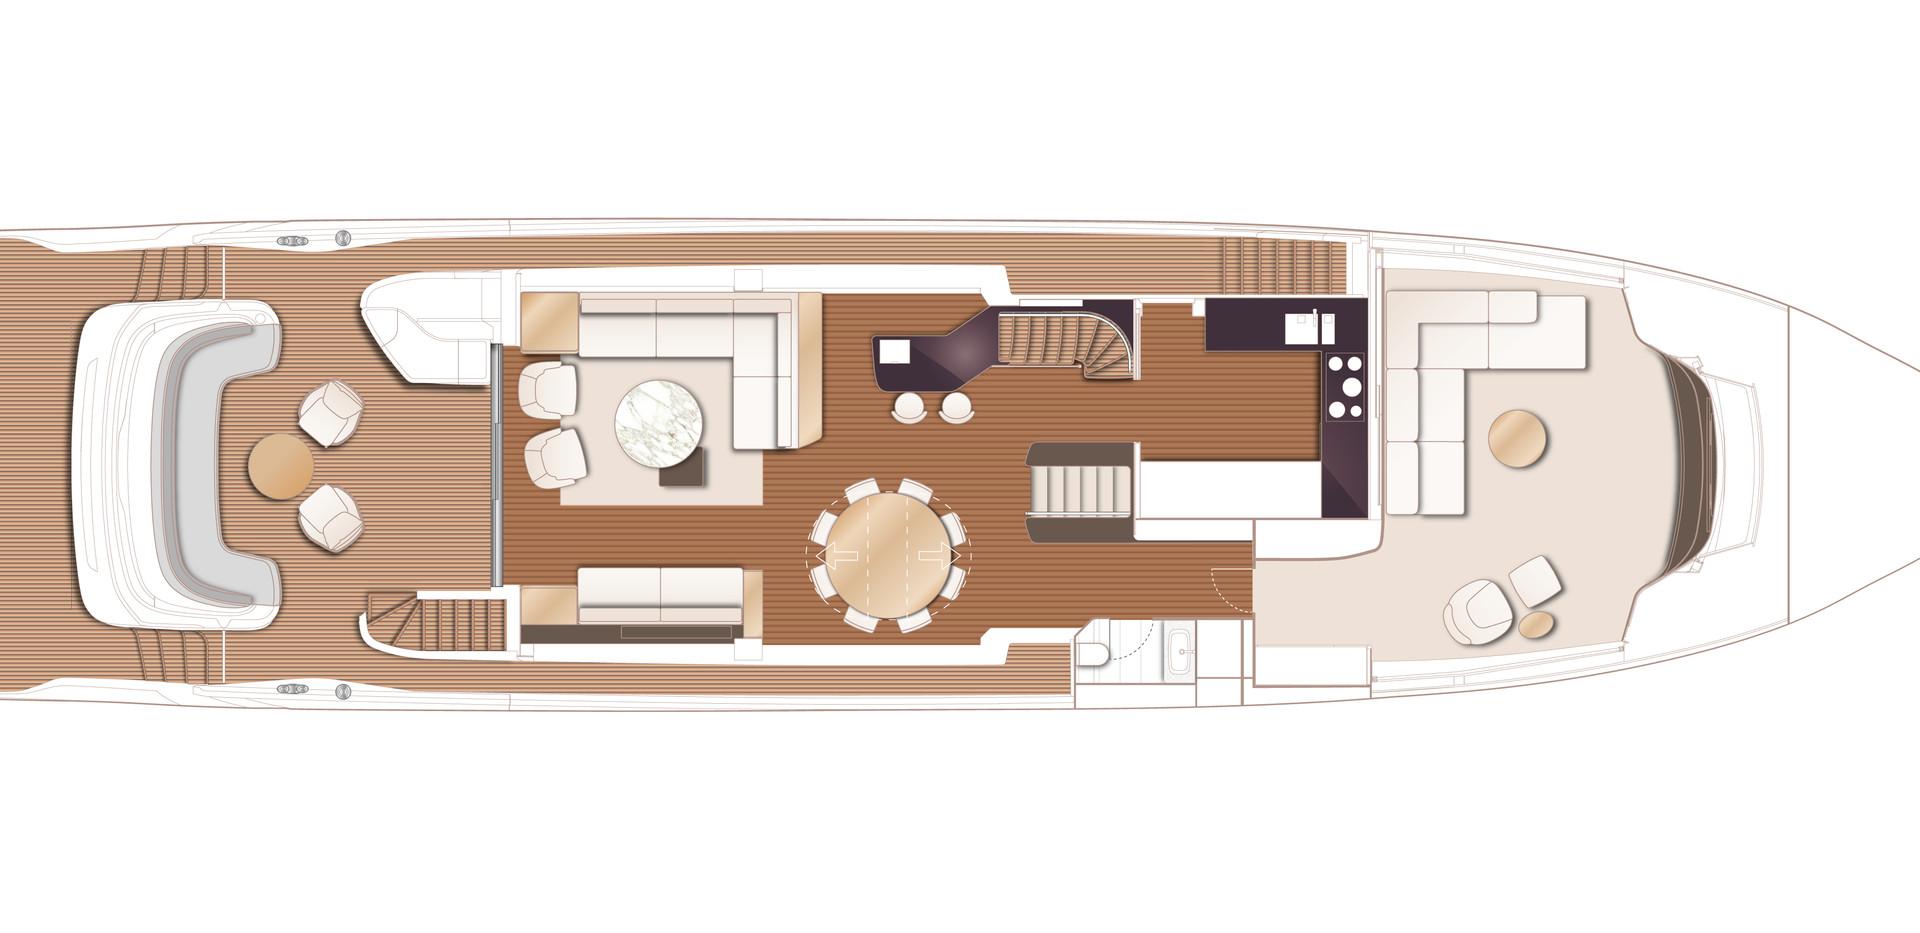 x95-main-deck-with-optional-main-deck-di